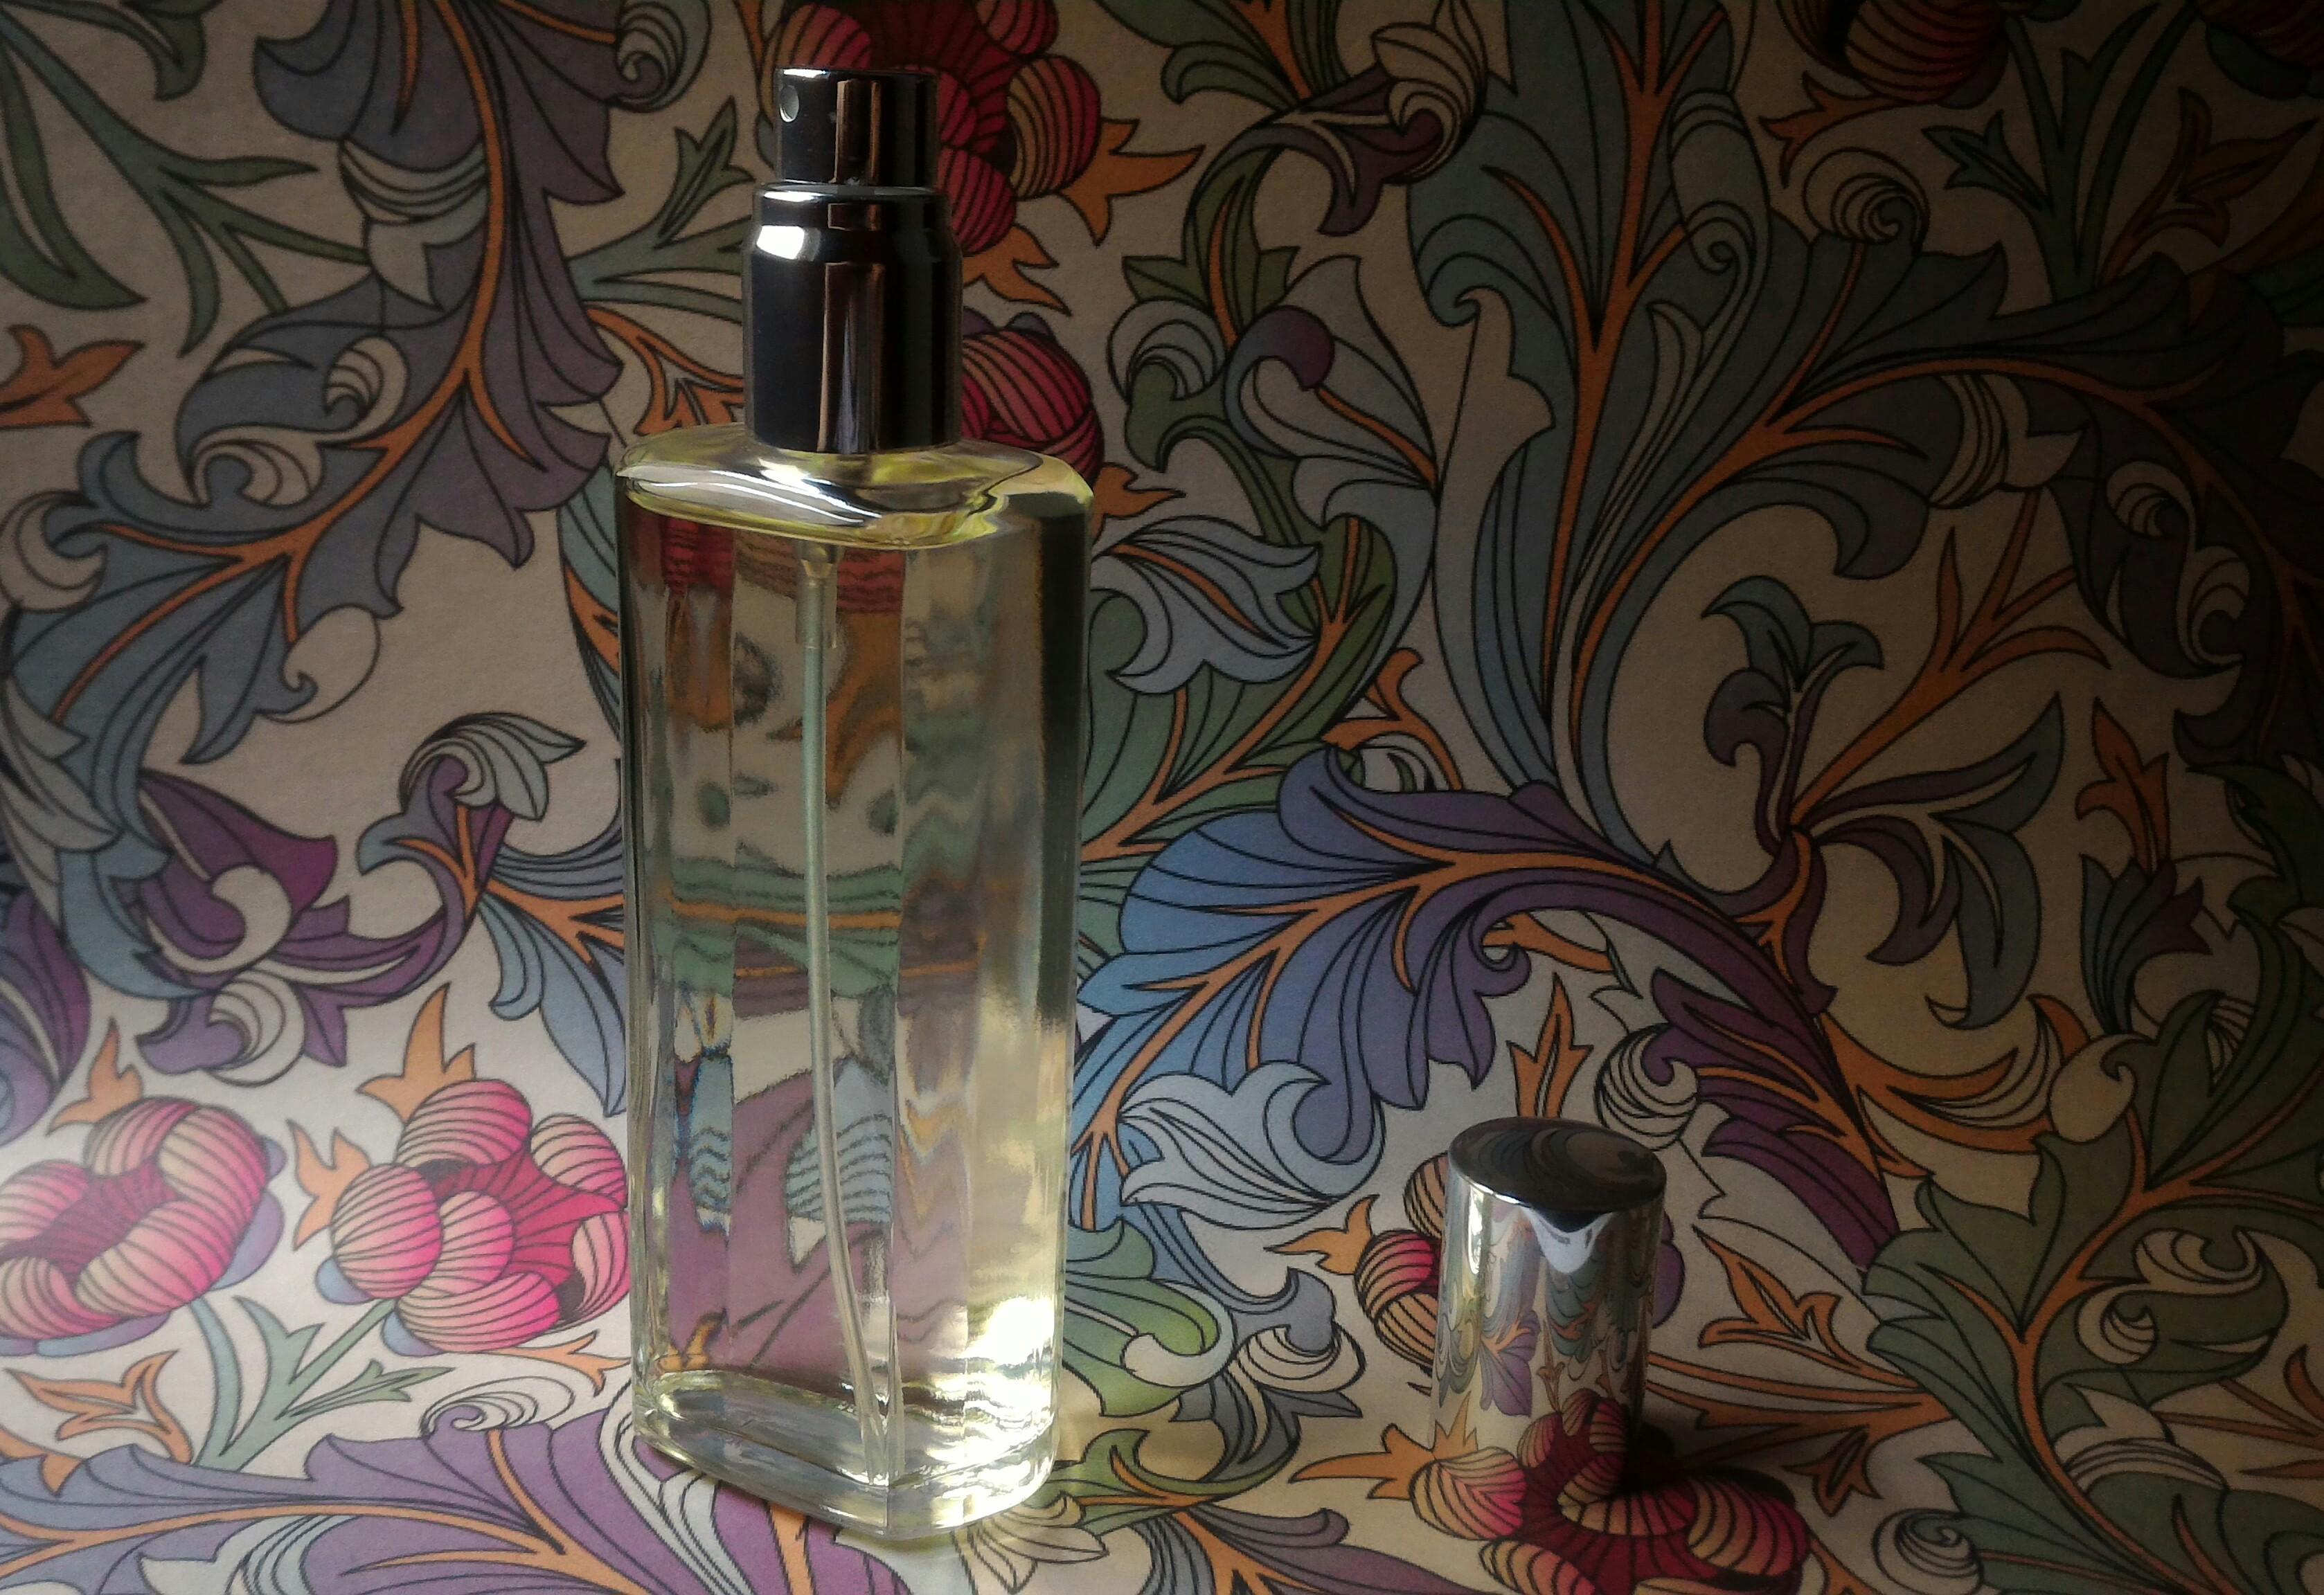 17a51cadecab2 Perfume Inspirado Chloe Feminino 5ml   Elo7